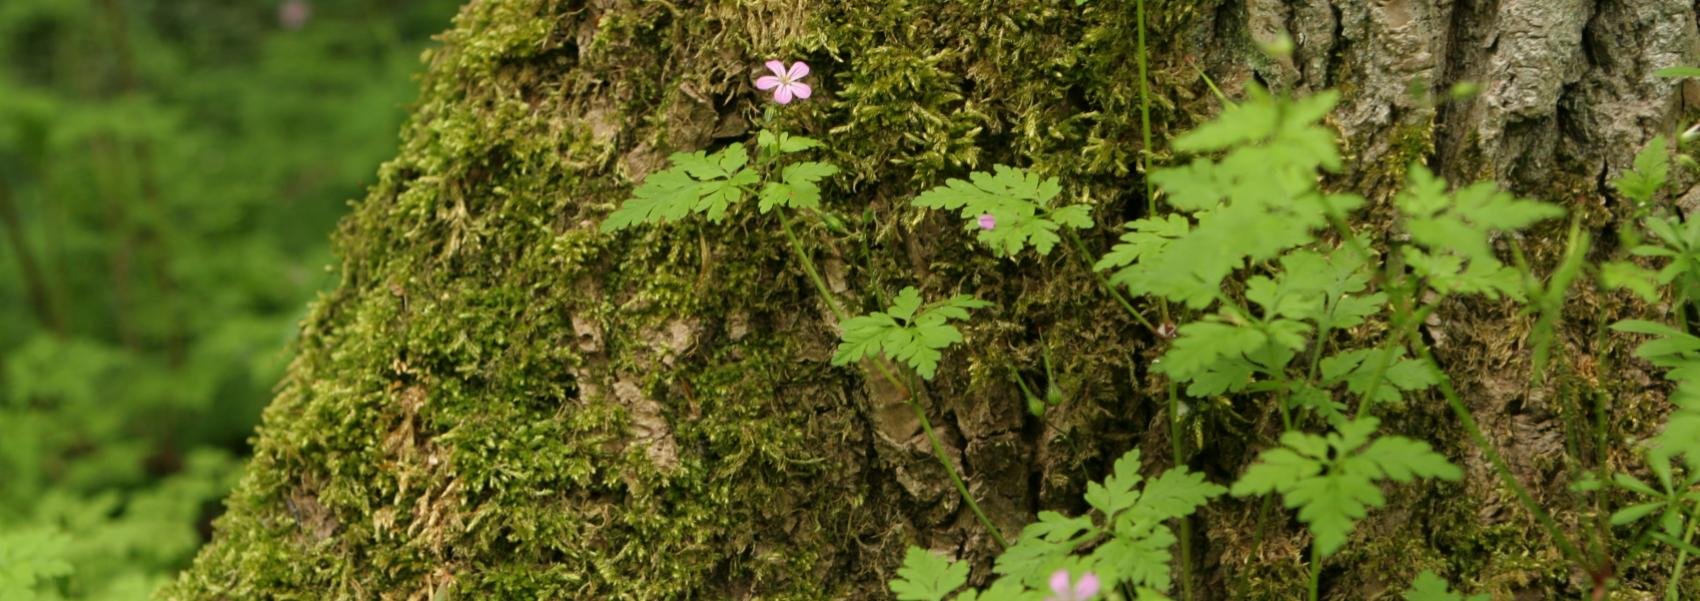 een boomstam vol mos